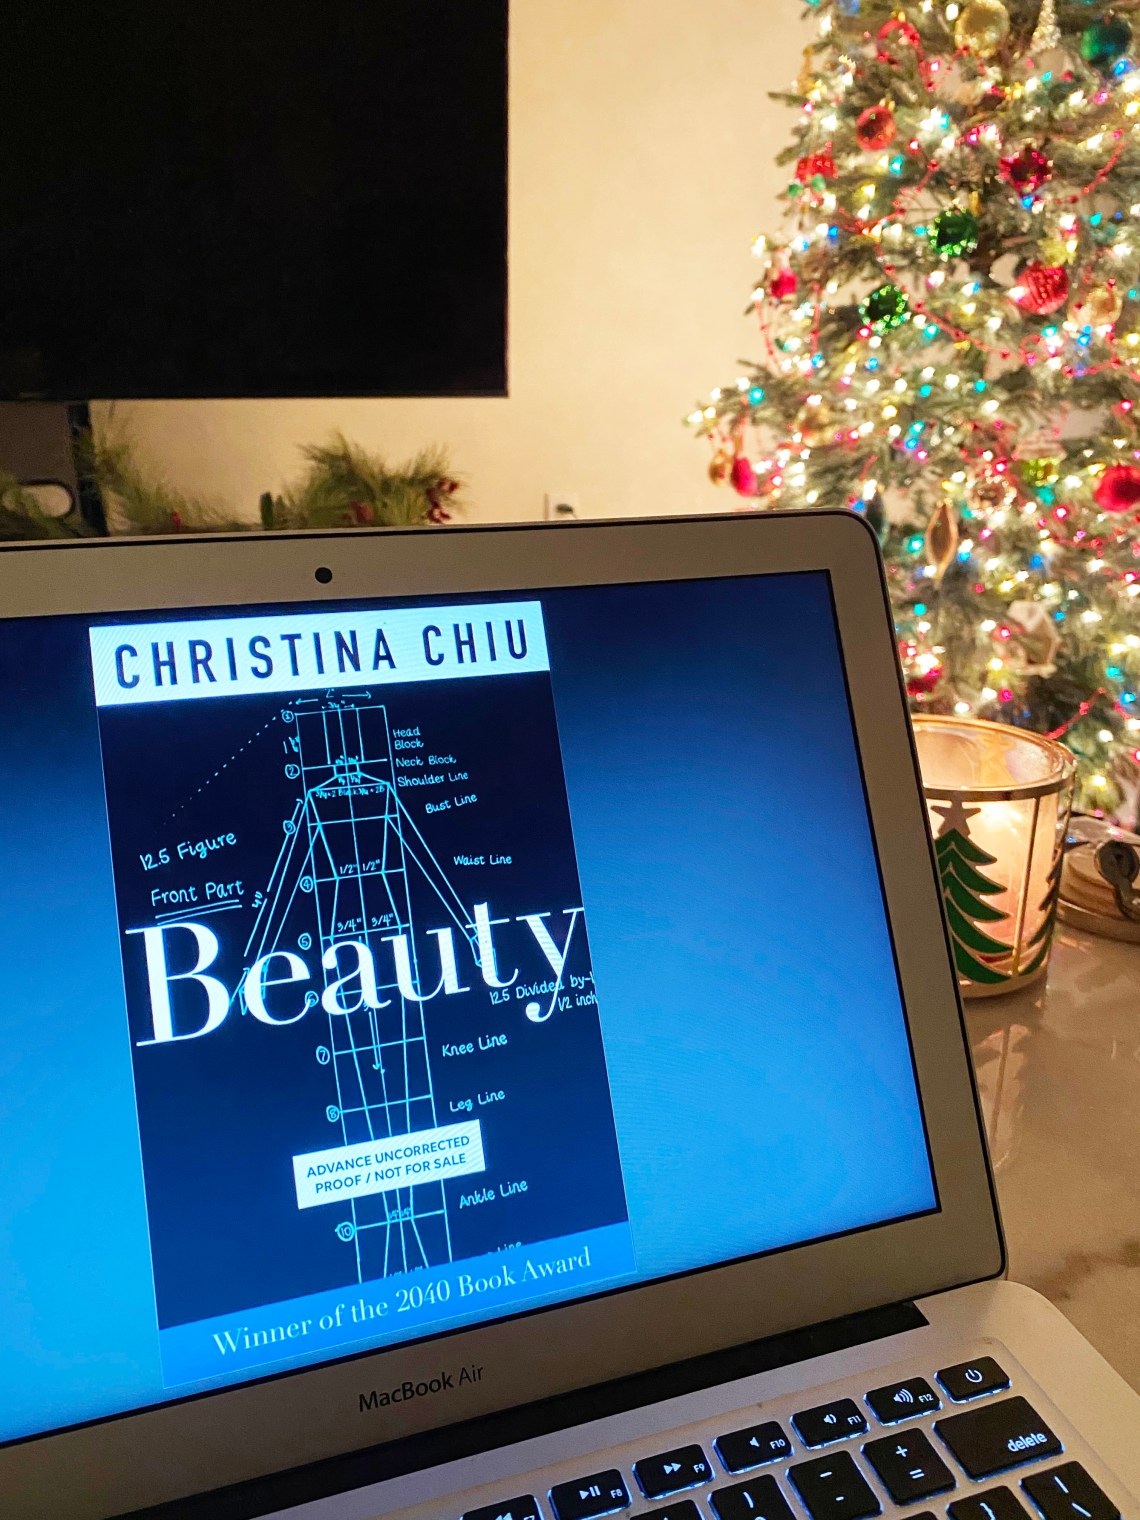 Beauty-Christina-Chiu